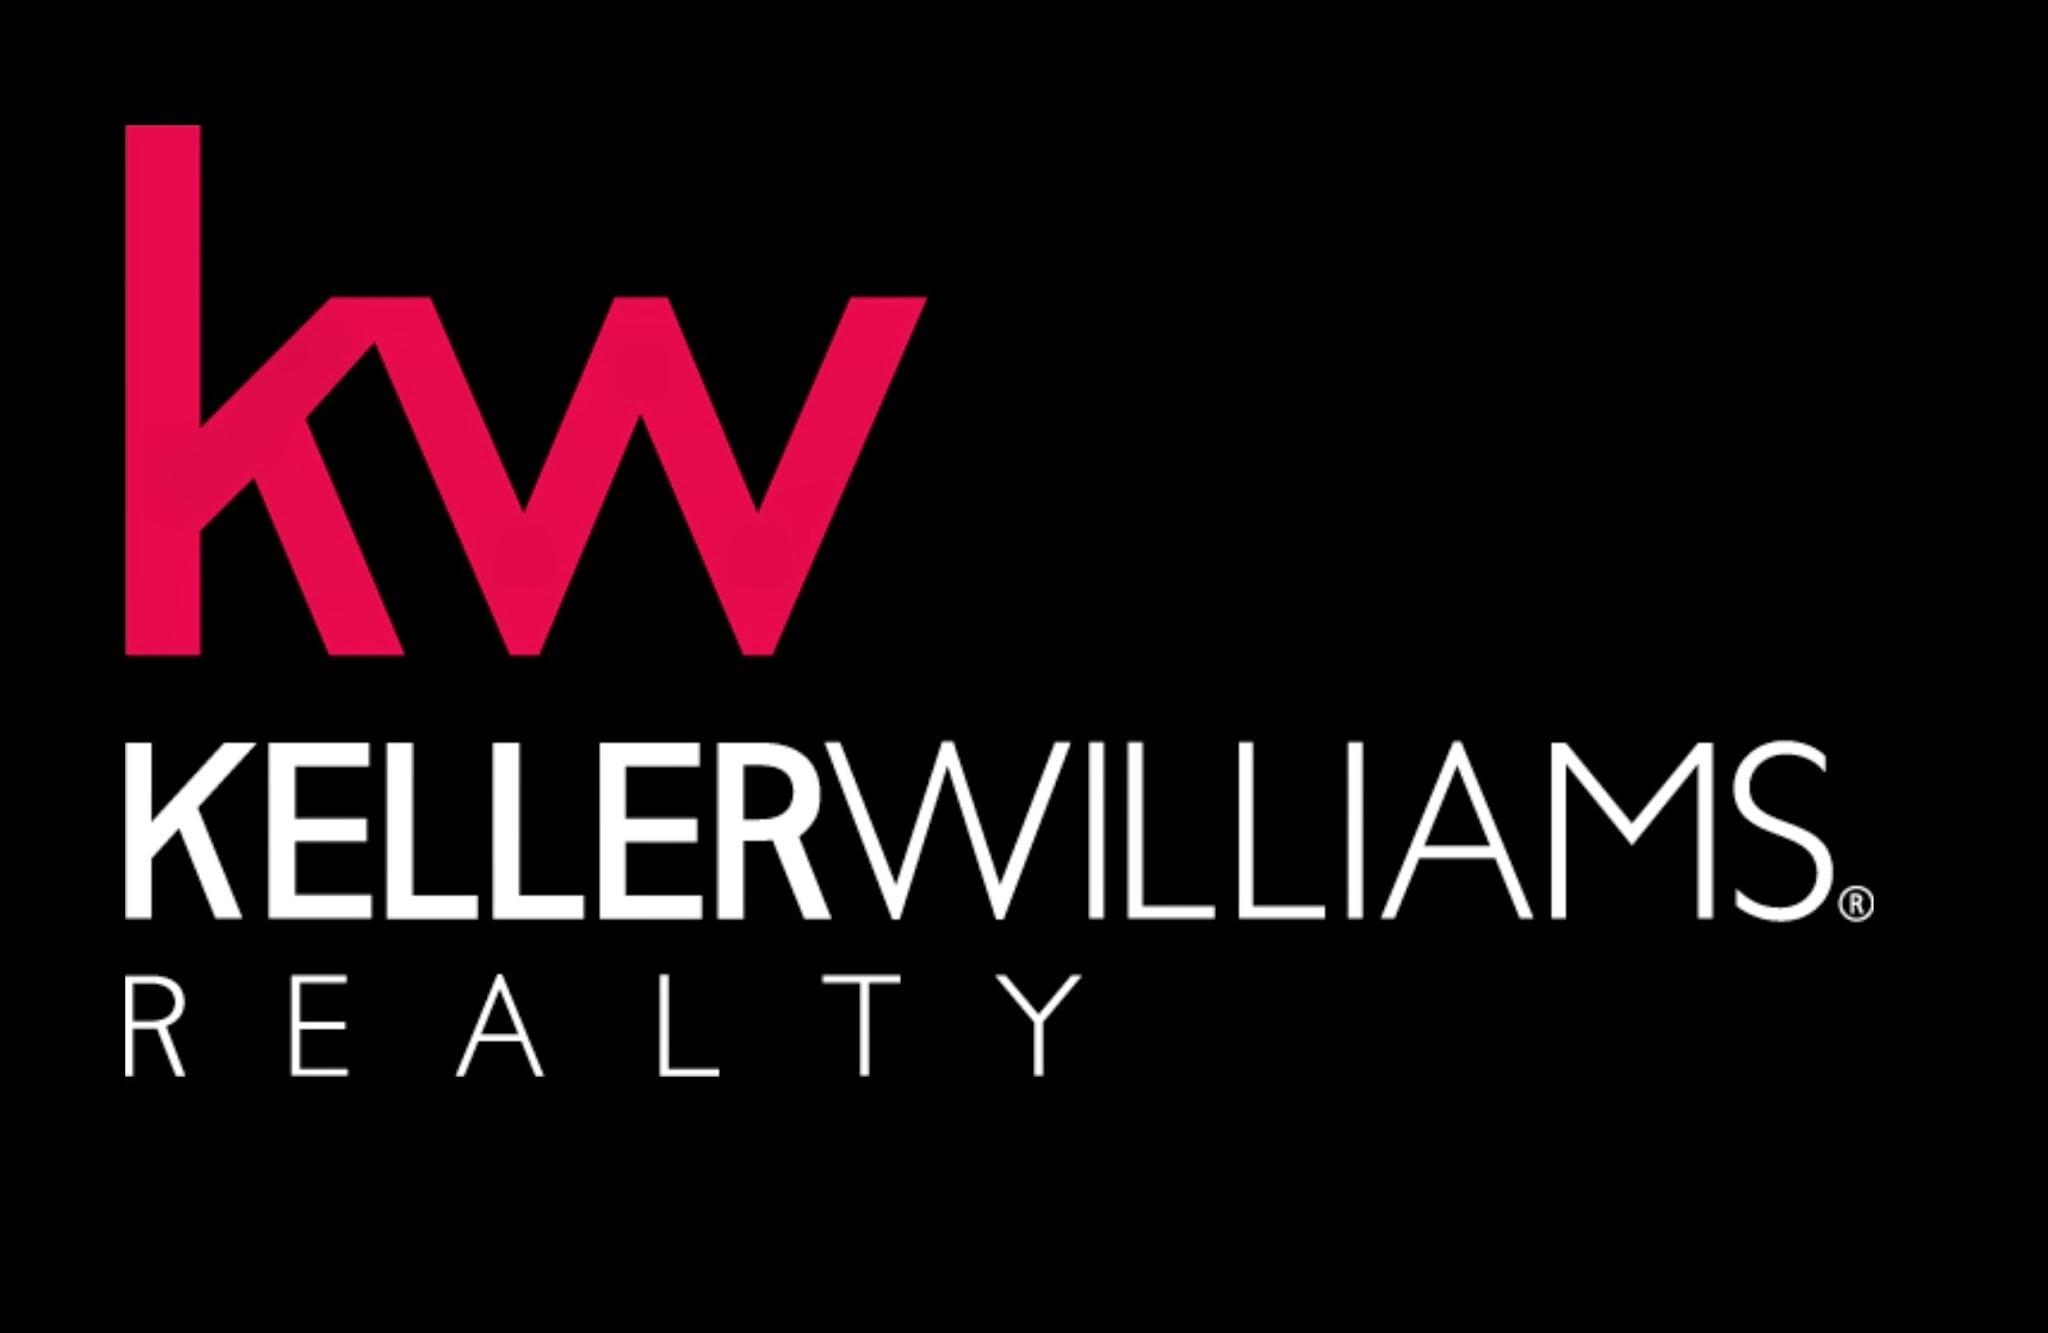 Evolution Real Estate - Keller Williams Realty WM logo